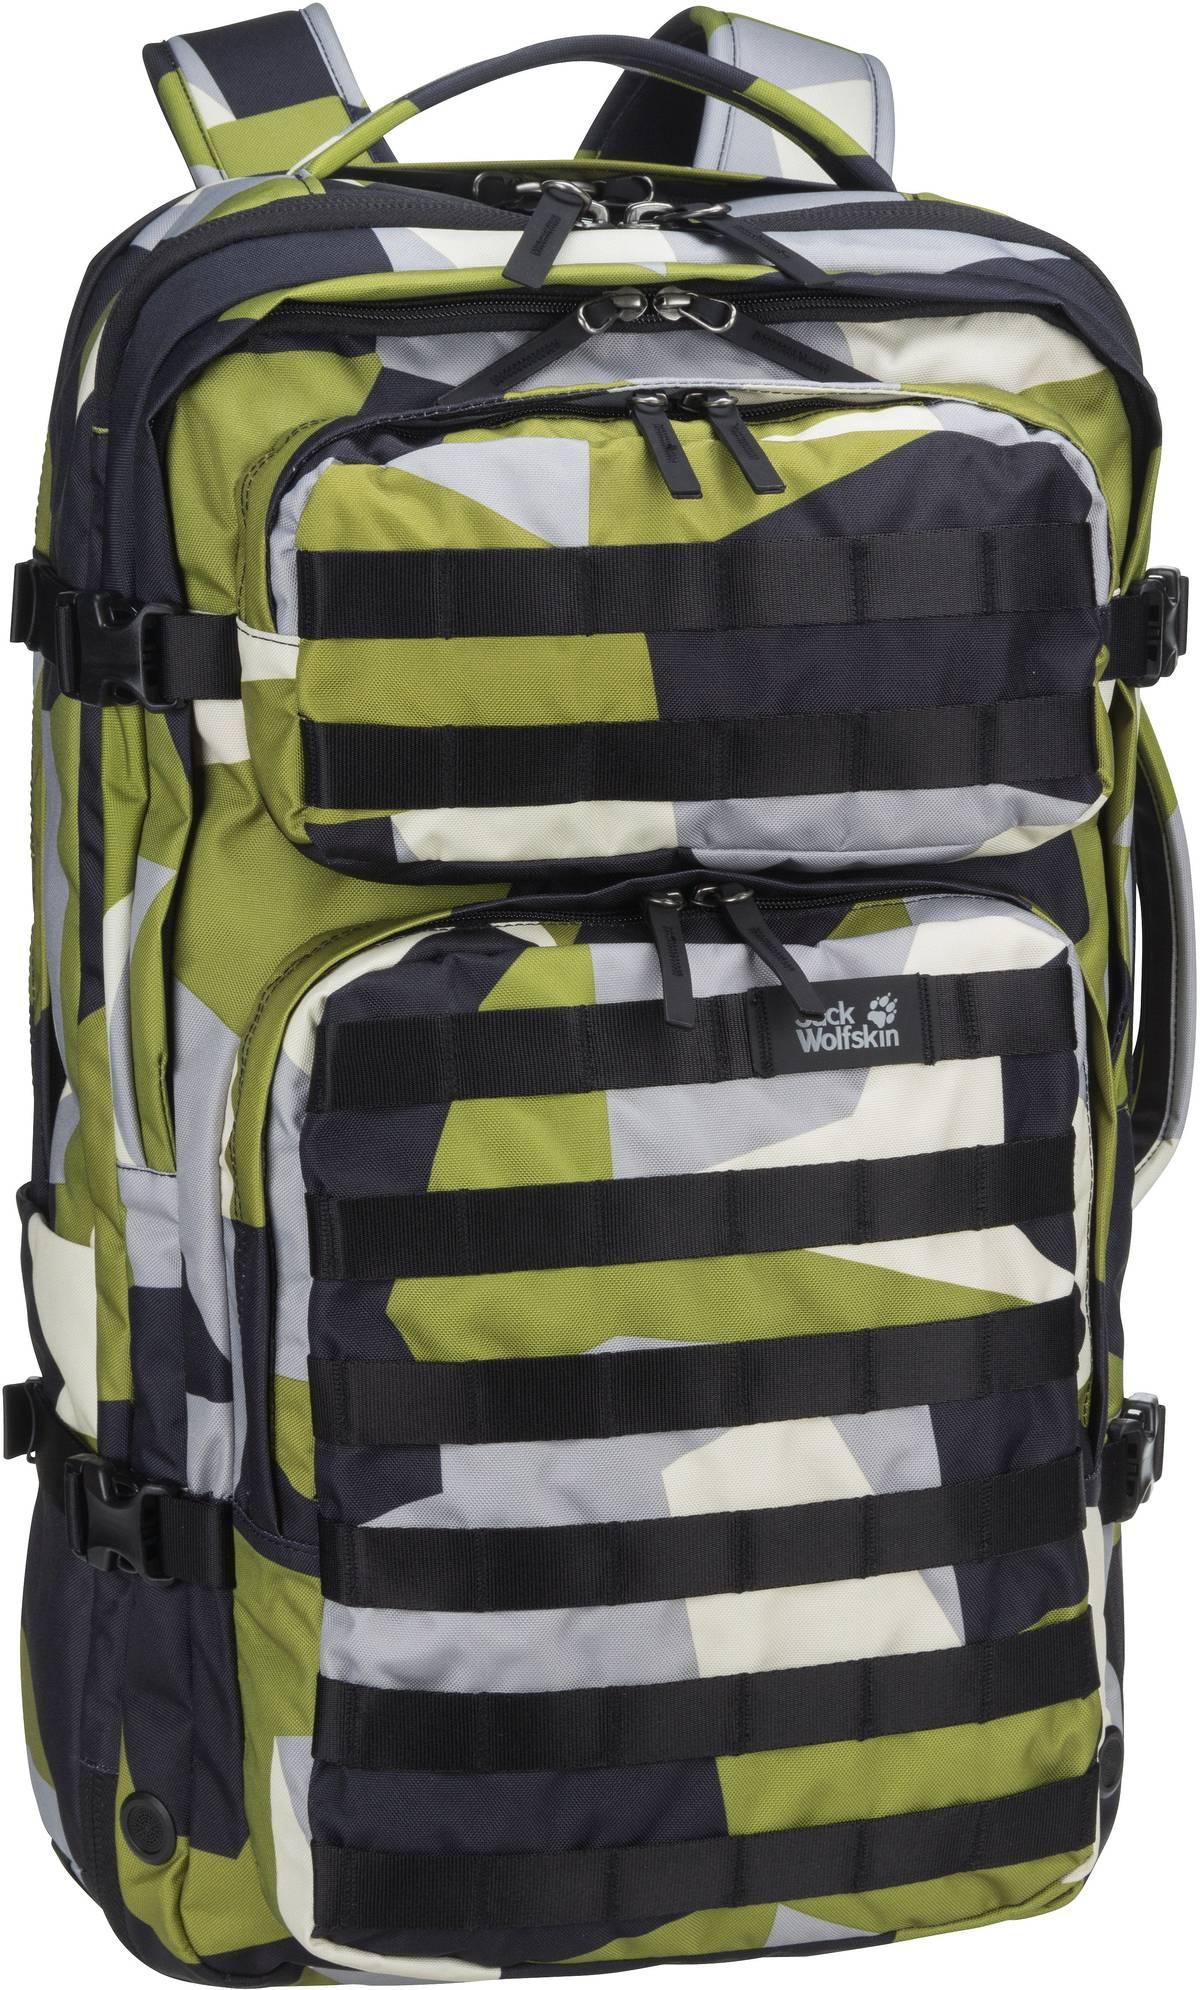 Rucksack / Daypack TRT 32 Pack Green Geo Block (32 Liter)